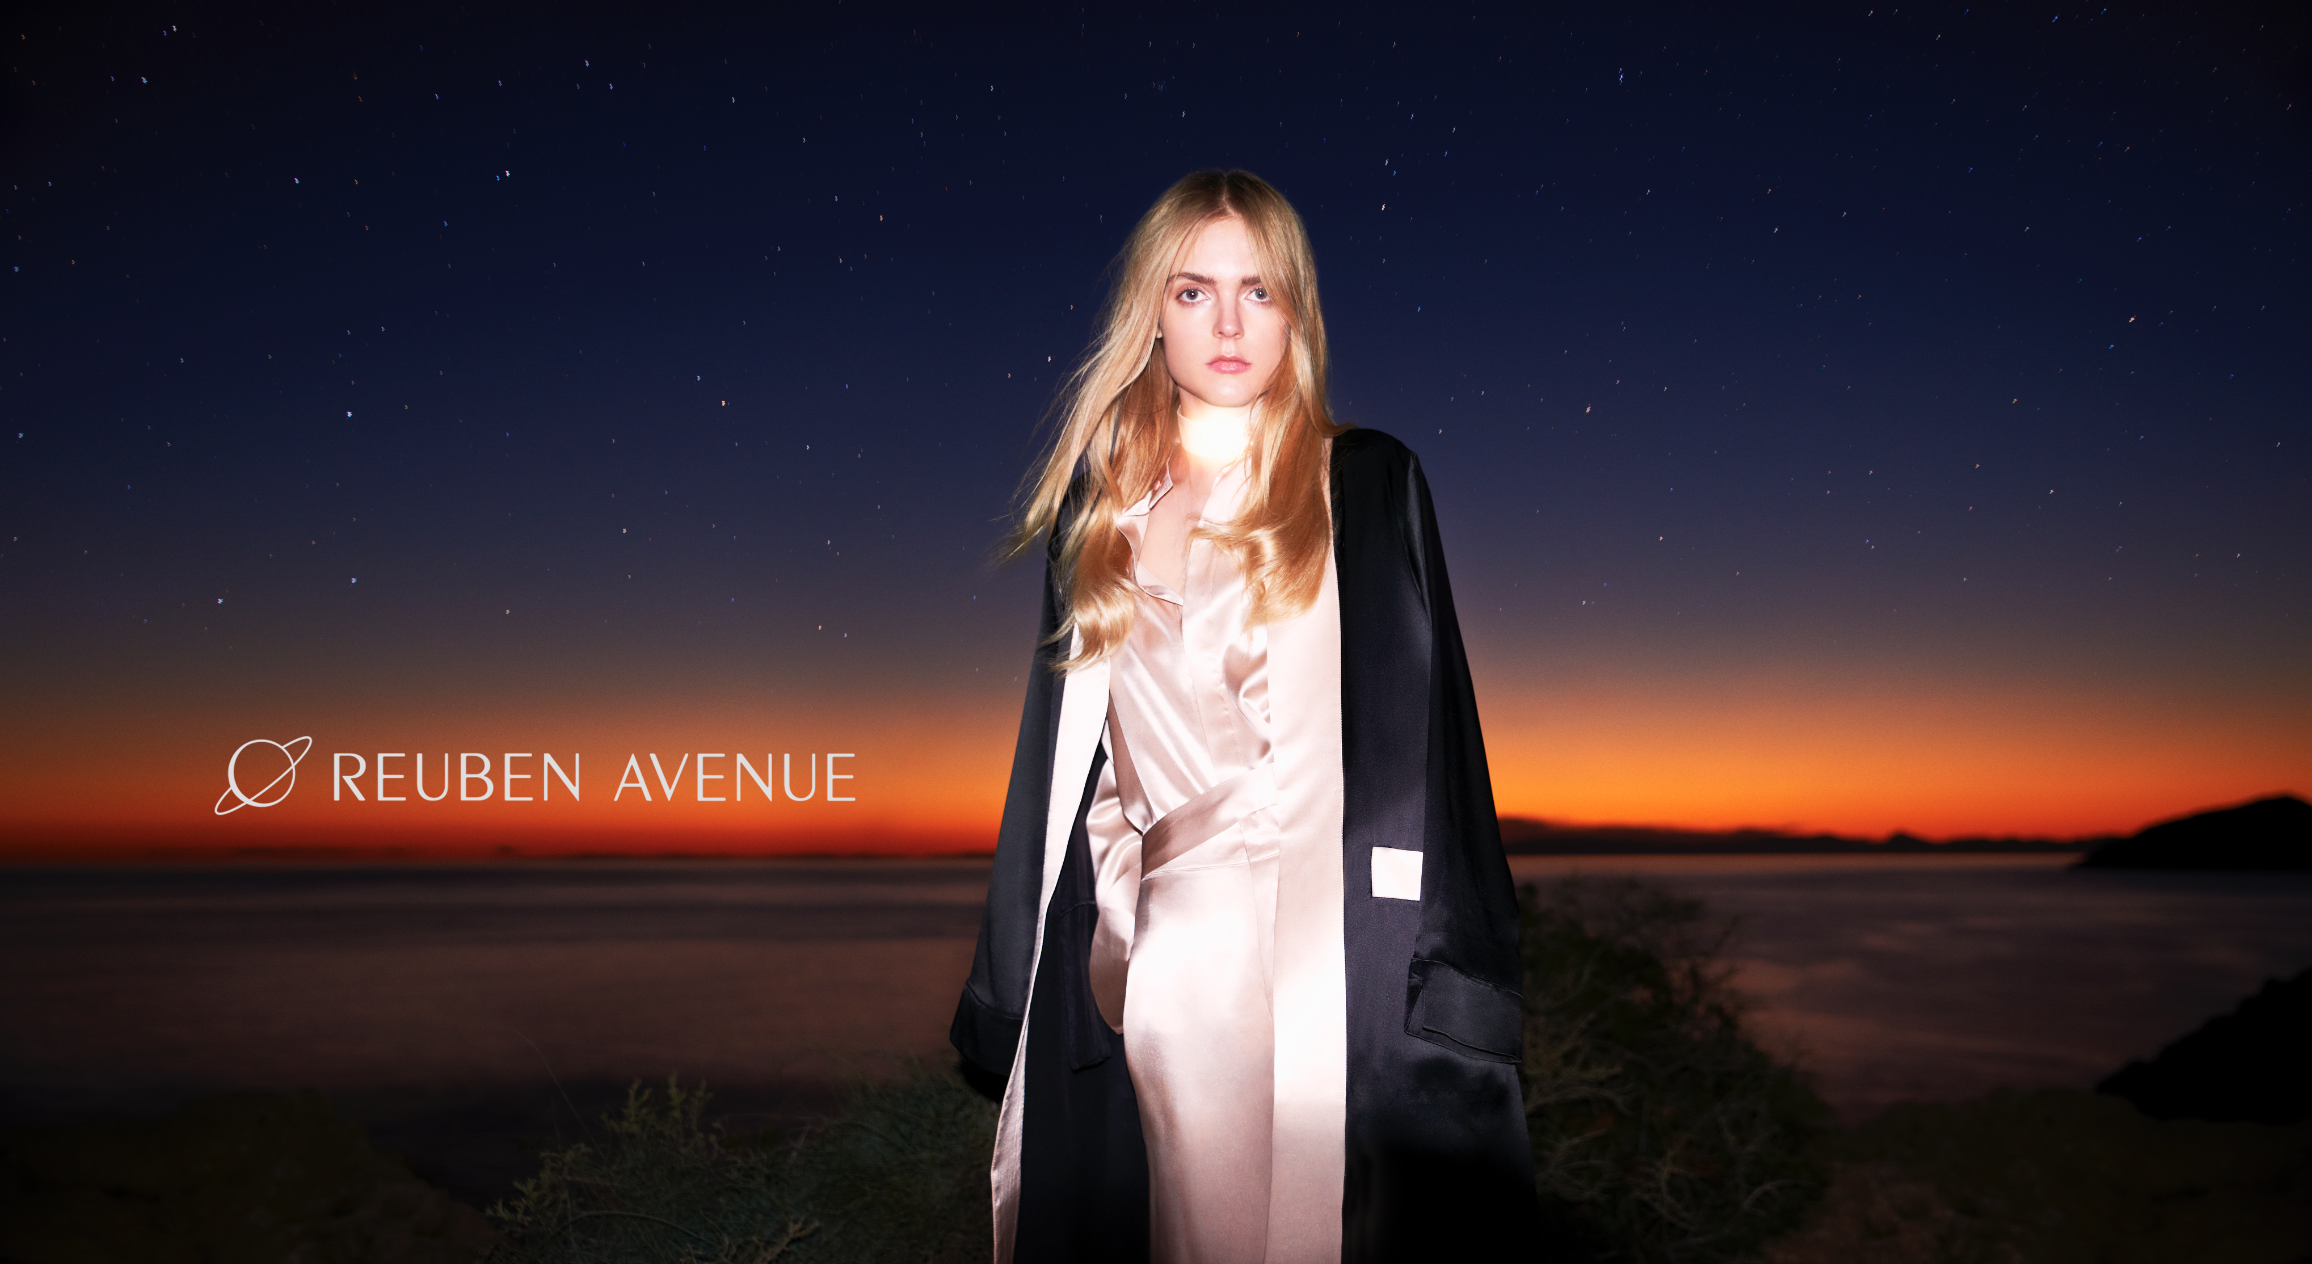 Reuben Avenue Campaign